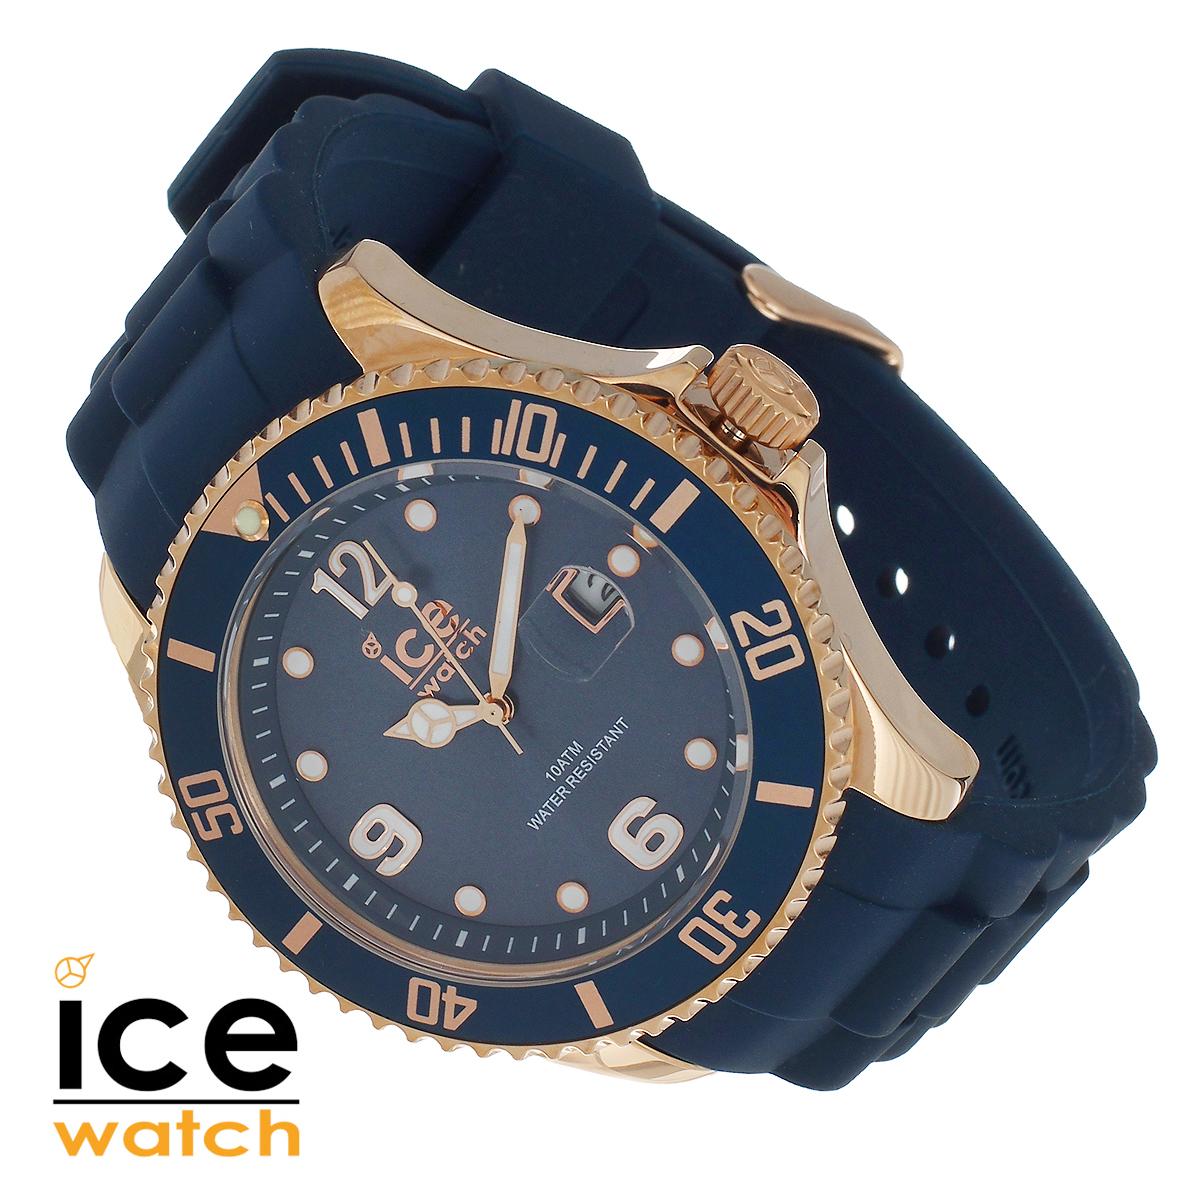 "Часы наручные Ice-Watch ""Ice-Style"", цвет: синий, золотой. IS.OXR.B.S.13 Big"